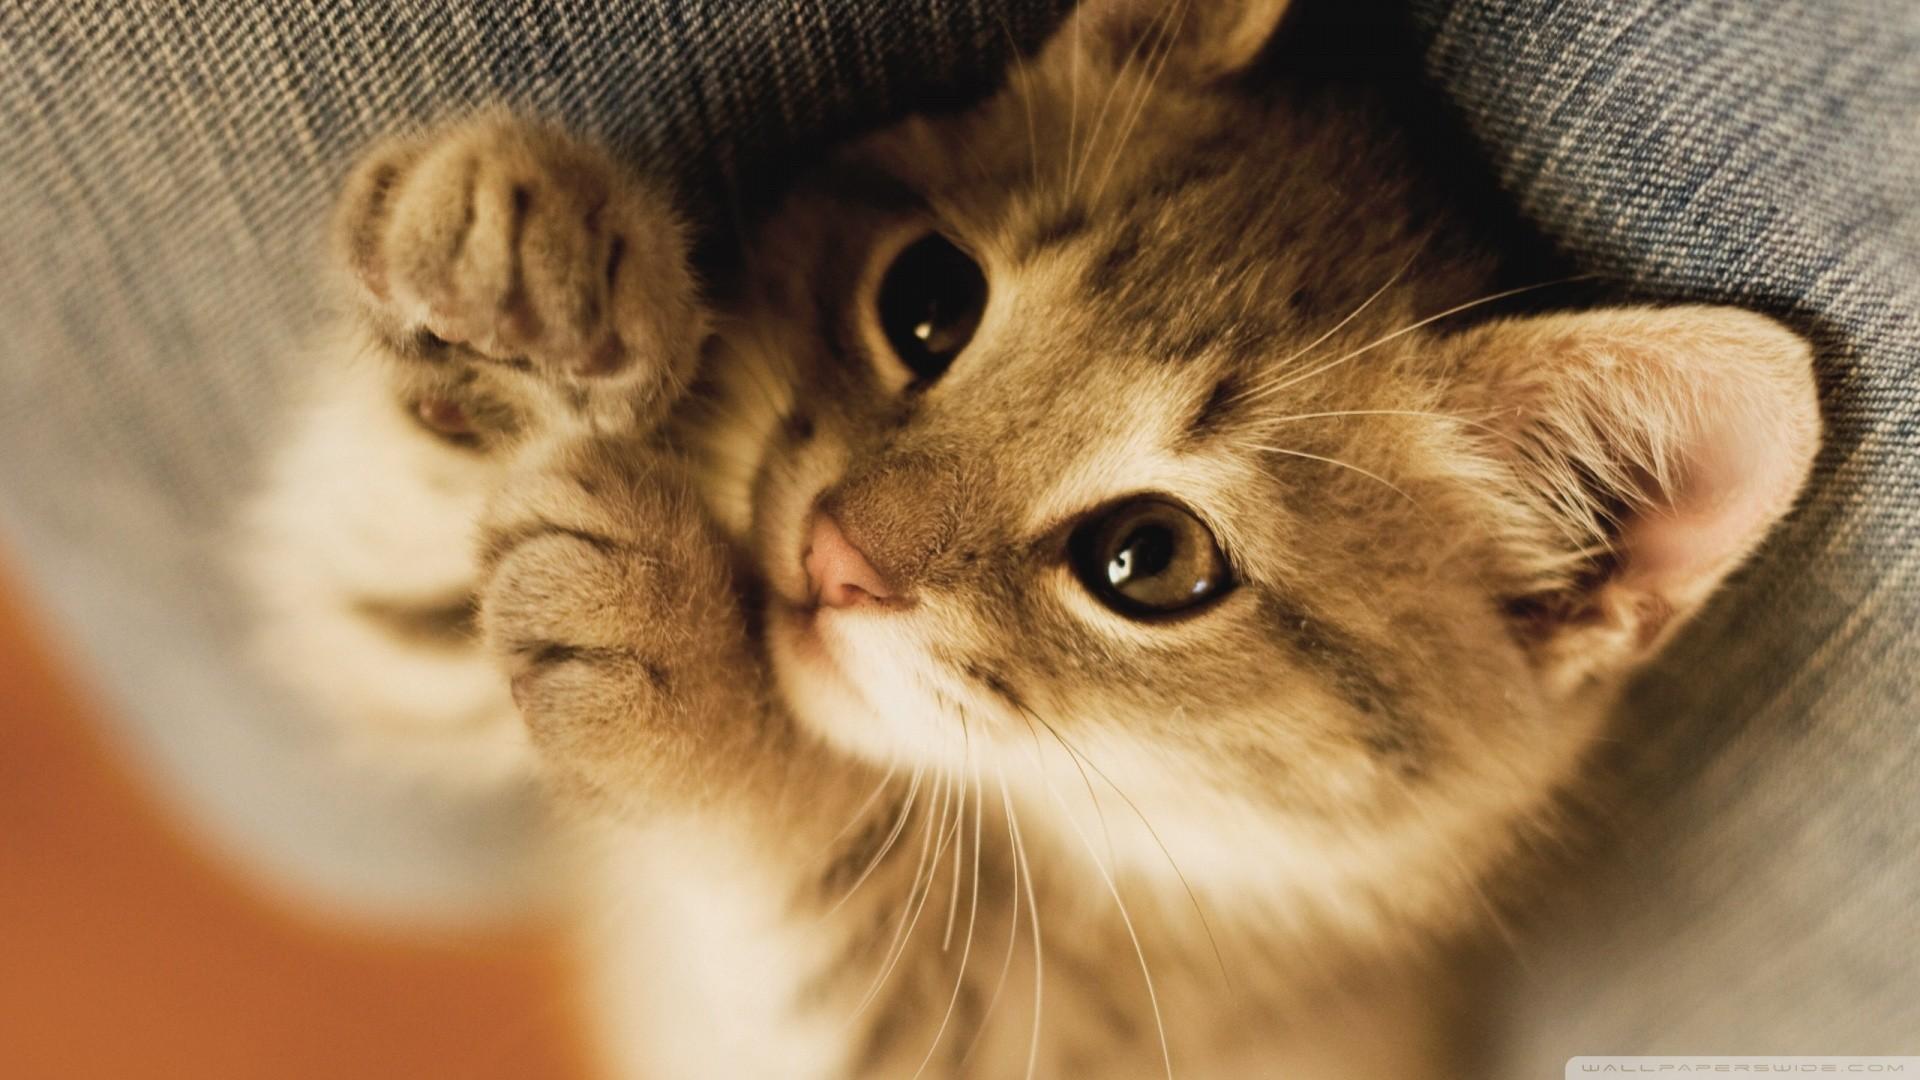 Cute kitten photo gallery Erotic Girls Gallery - Photo Series